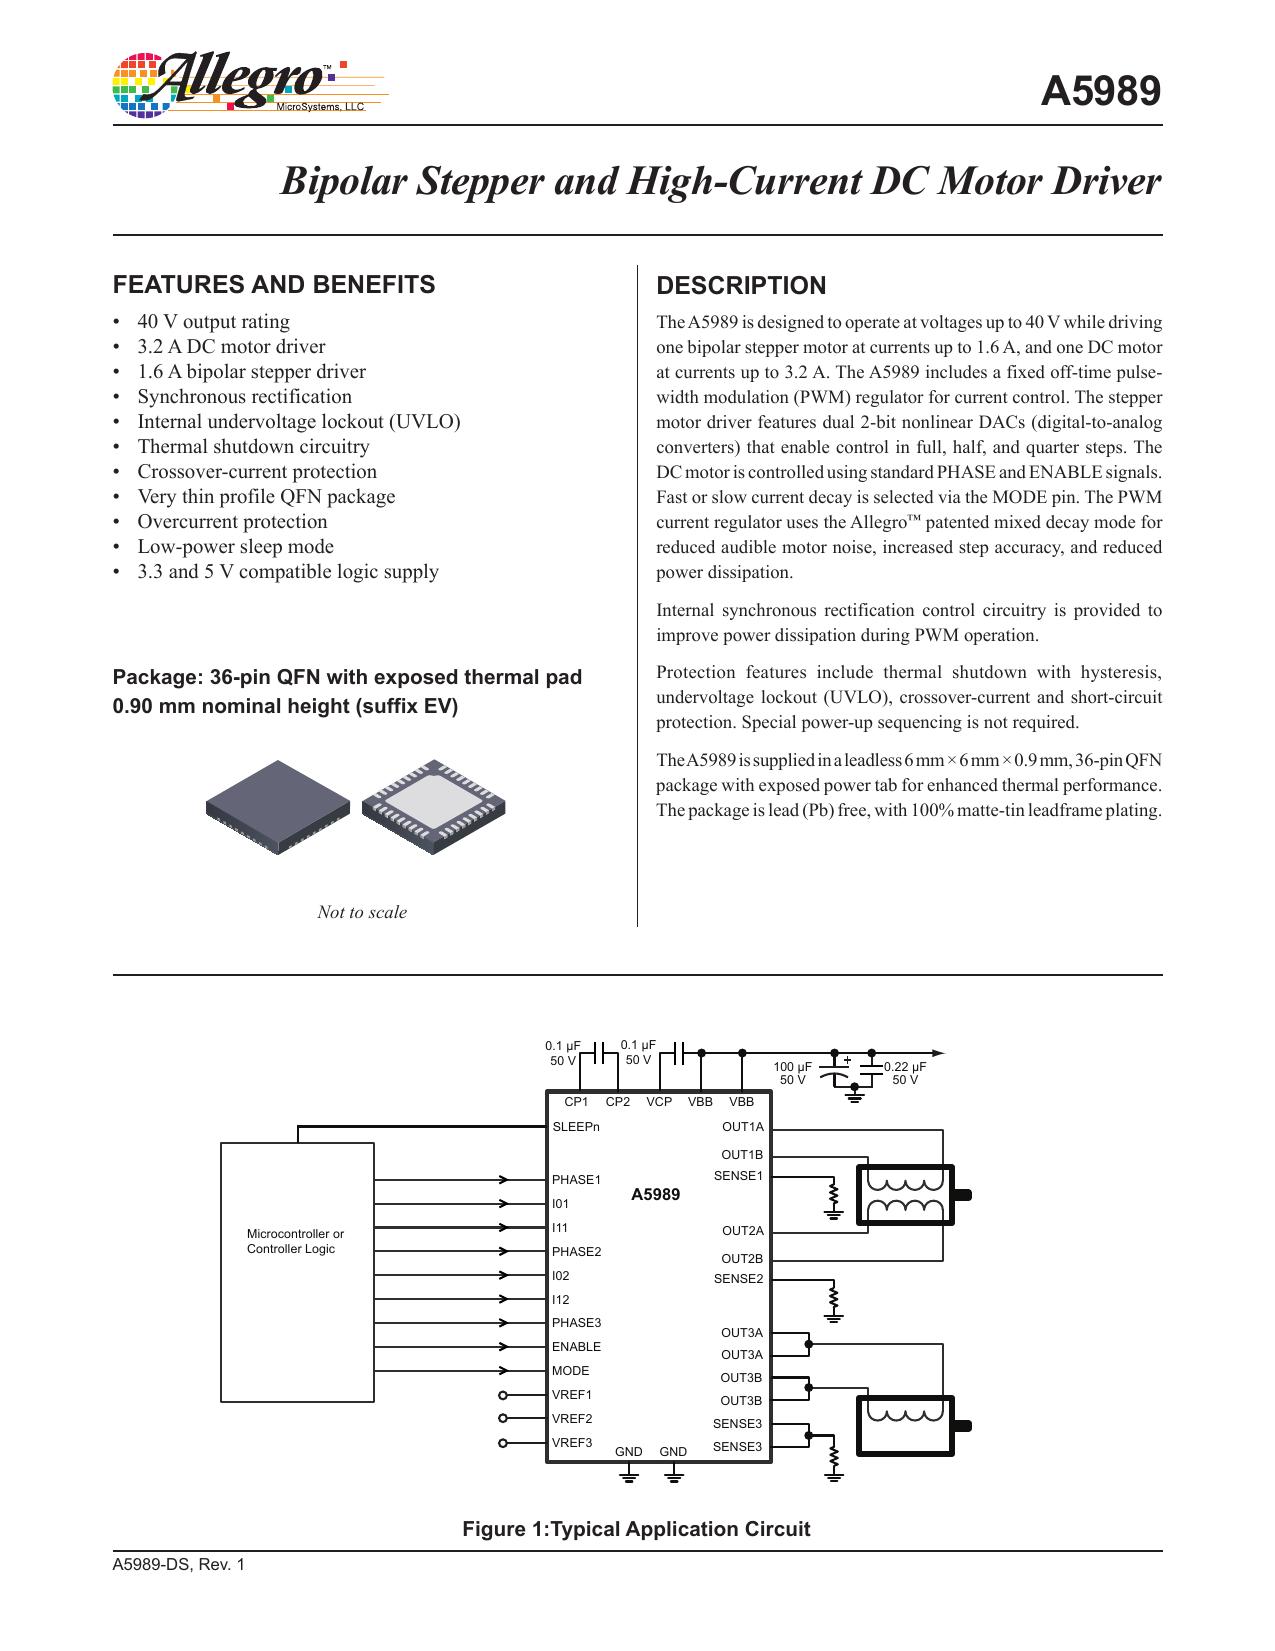 A5989 Datasheet Allegro Microsystems Bipolar Stepper Motor Drive Circuitdb